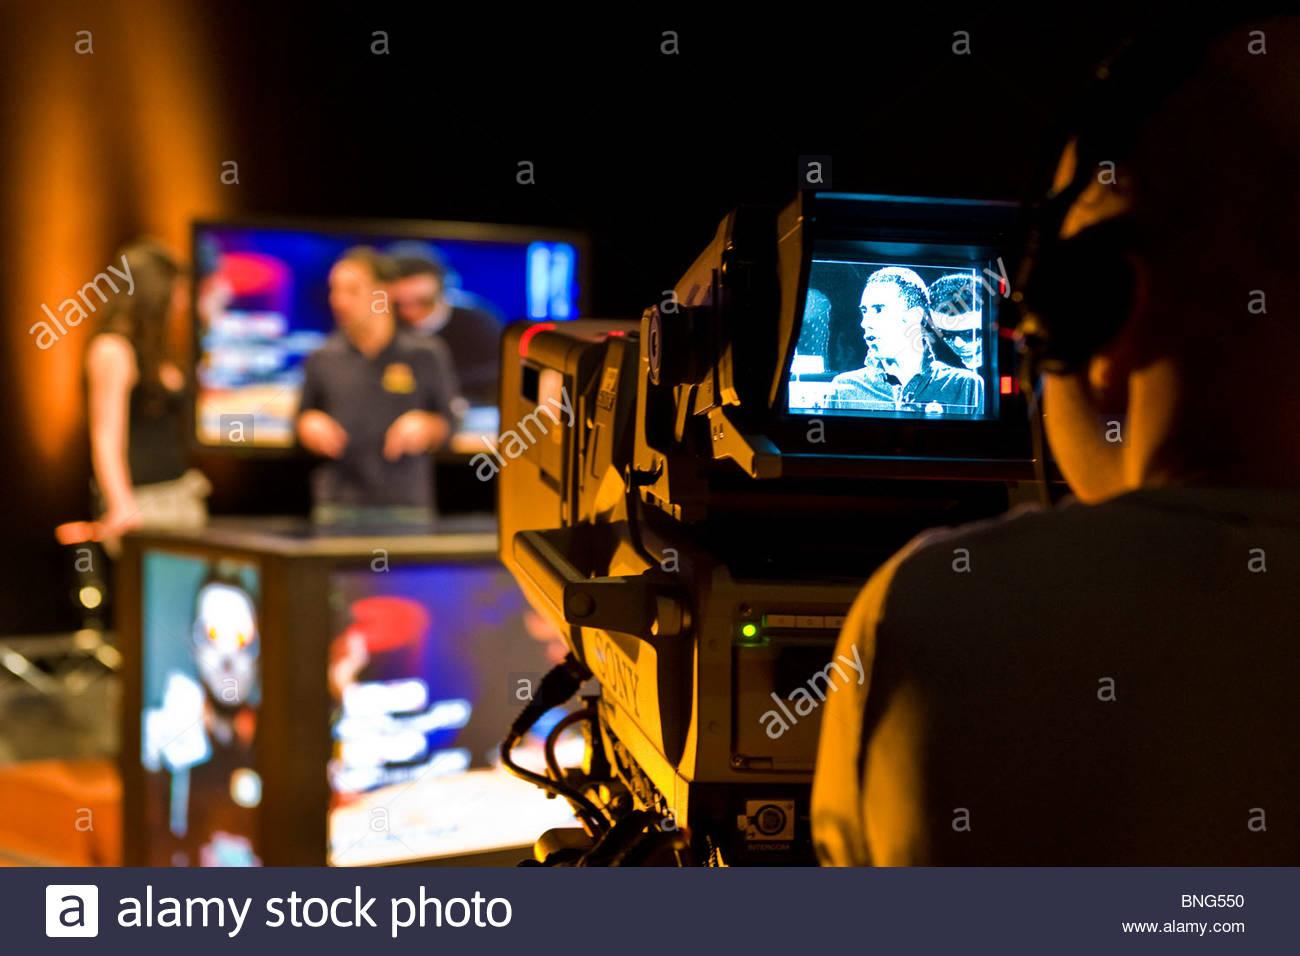 Cameraman,Poker digitale show,Tele Lombardia Immagini Stock